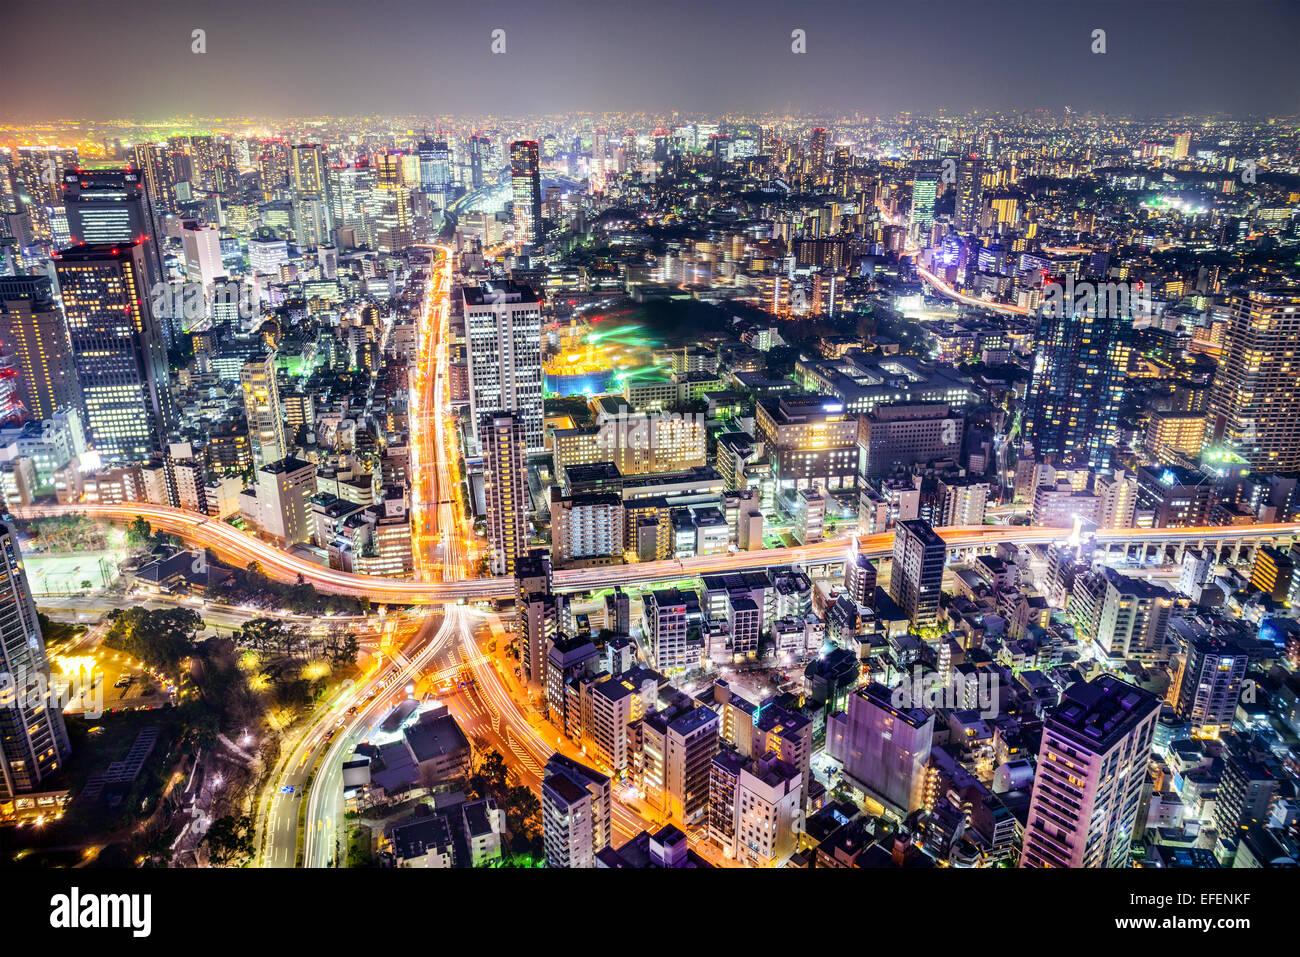 Tokyo, Japan Stadtbild und Autobahnen. Stockbild